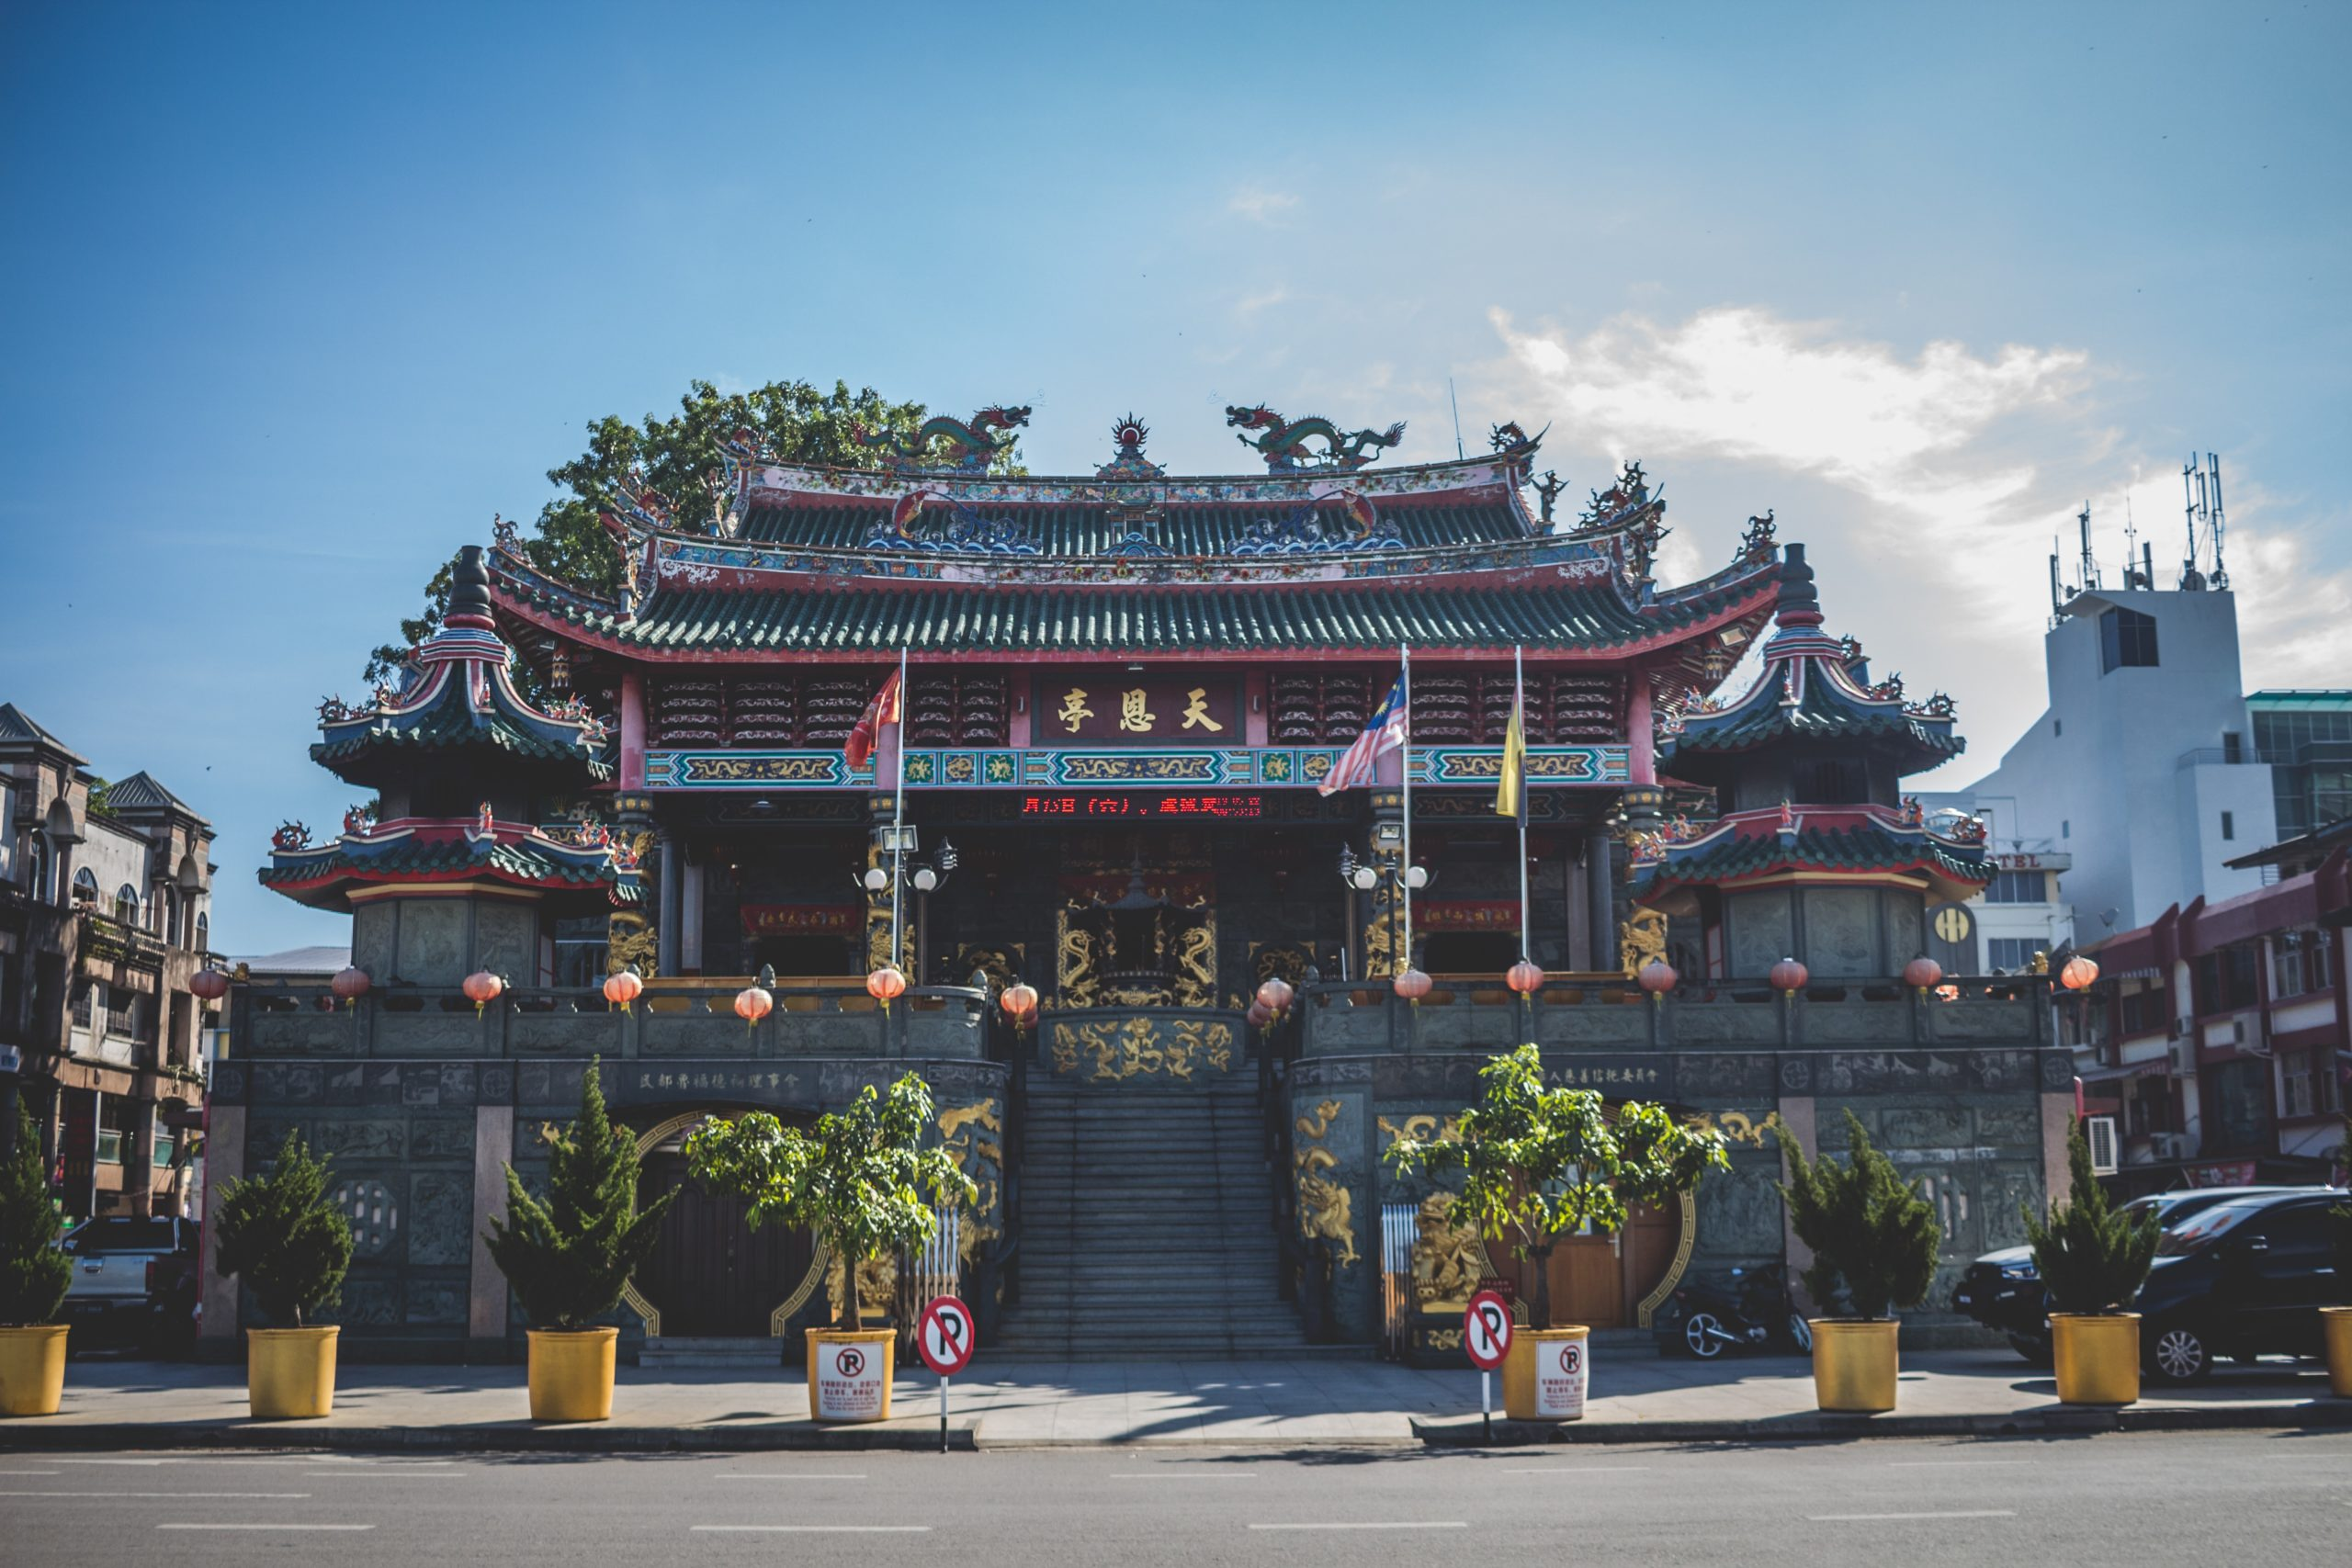 Tempel Tua Pek Kong auf Borneo